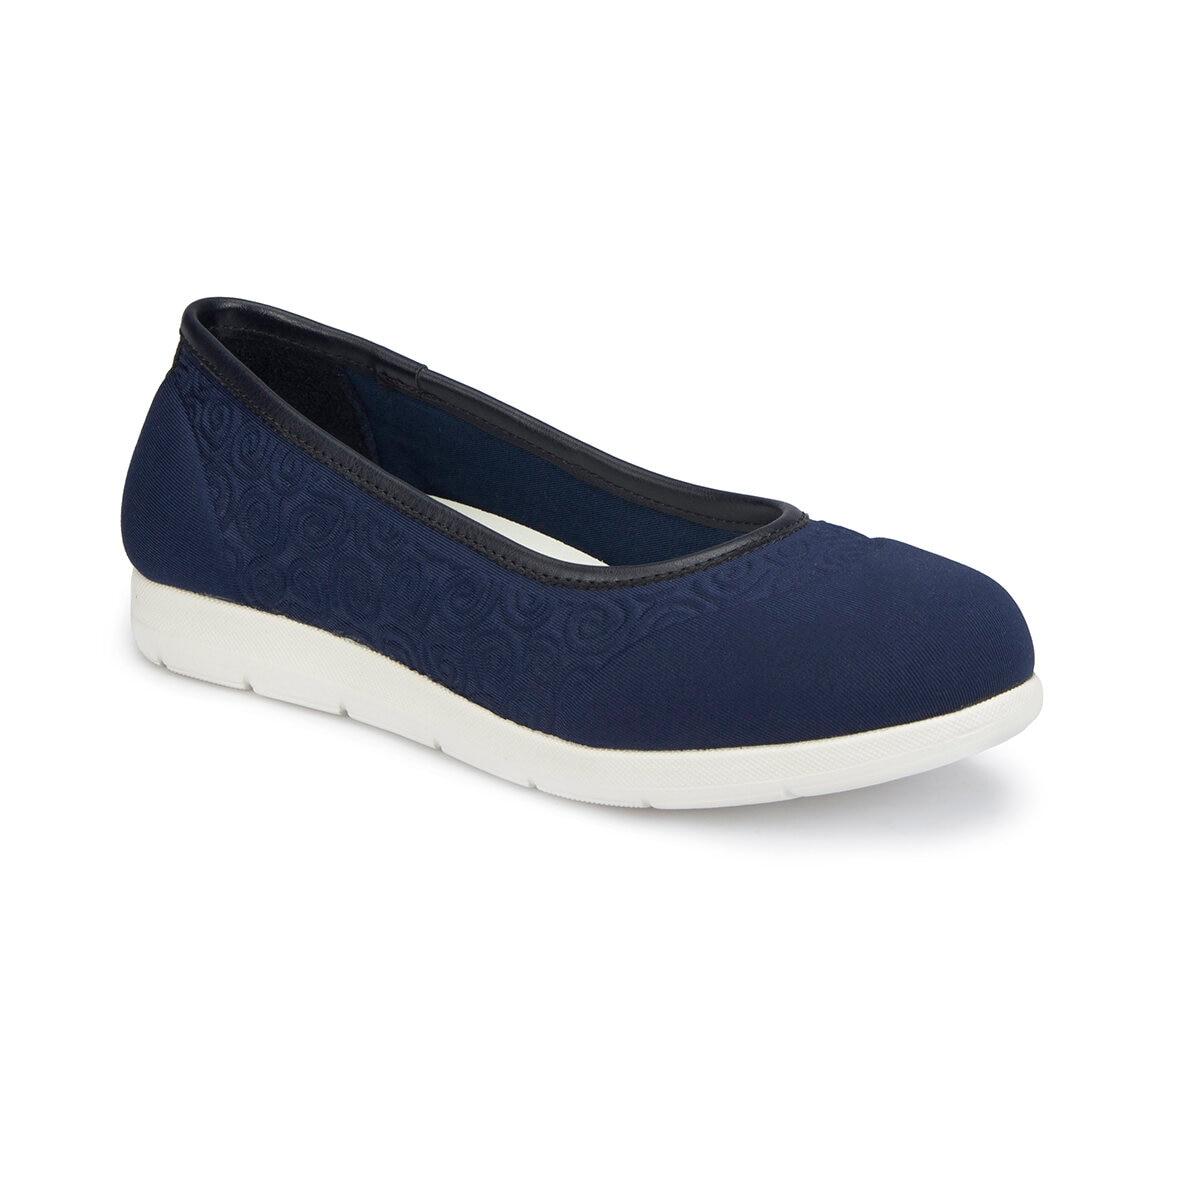 FLO 81. 111268.Z Navy Blue Women Basic Comfort Polaris